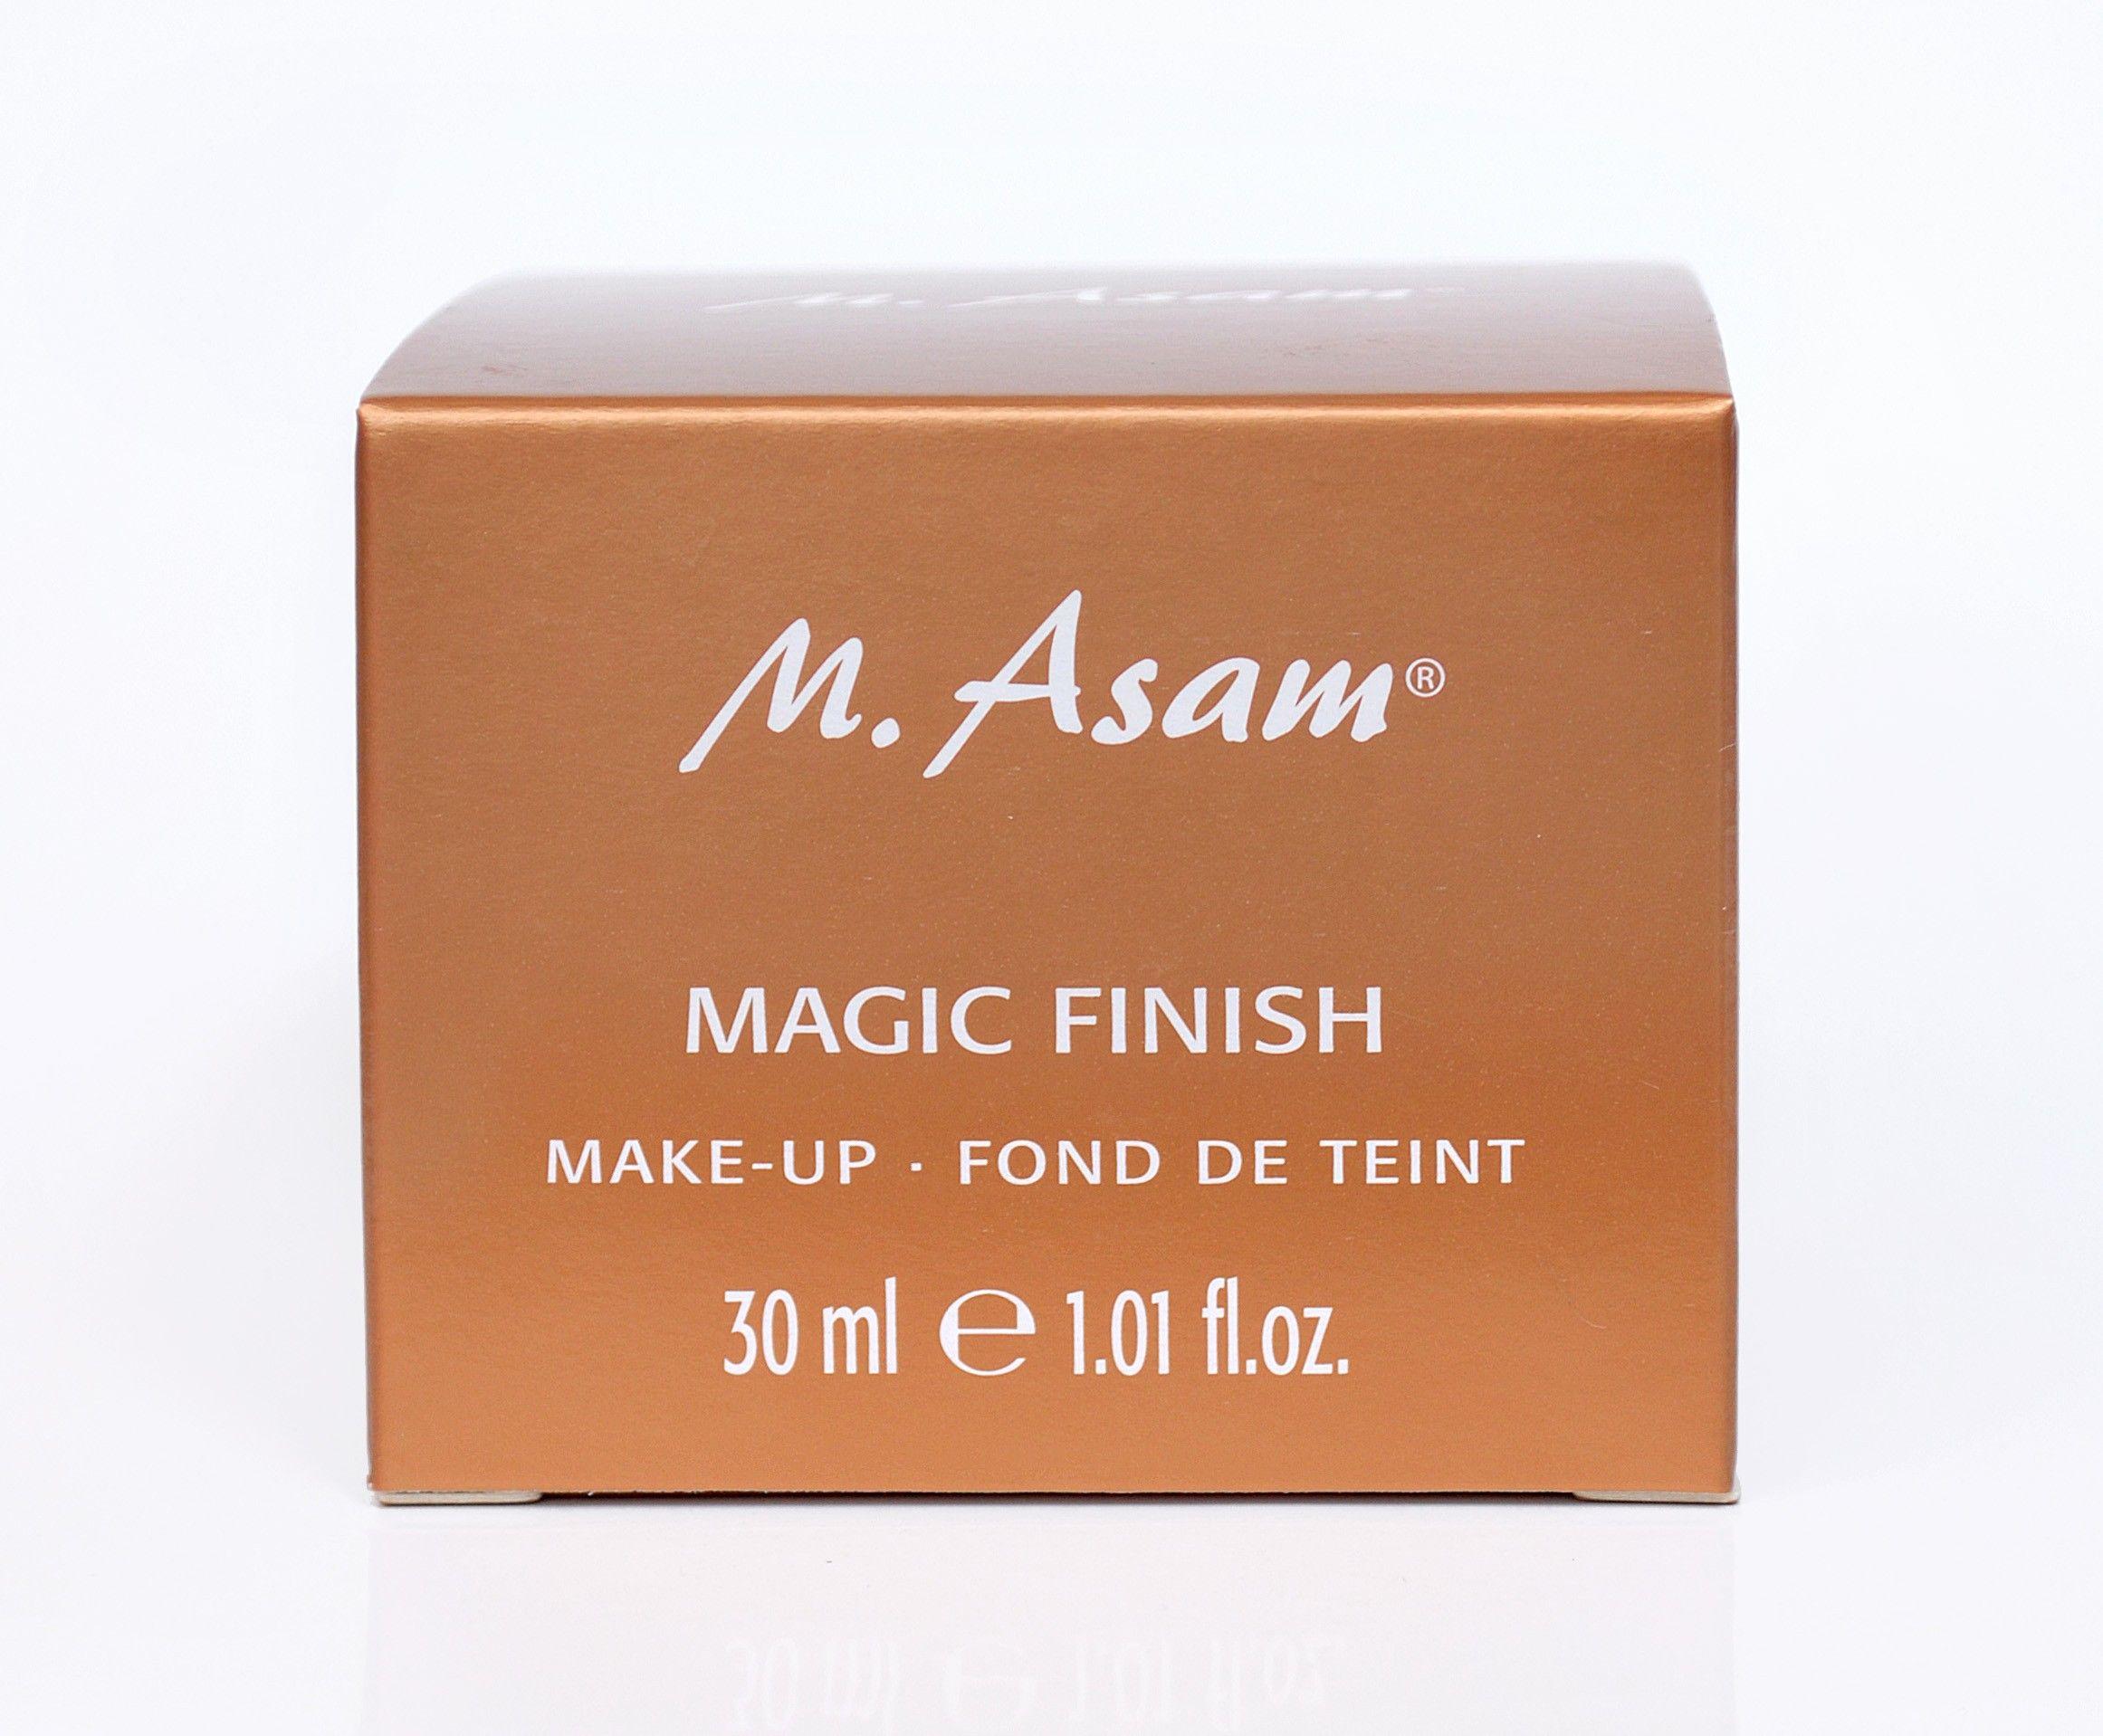 M. Asam Magic Finish Makeup 30ml Makeup, It is finished